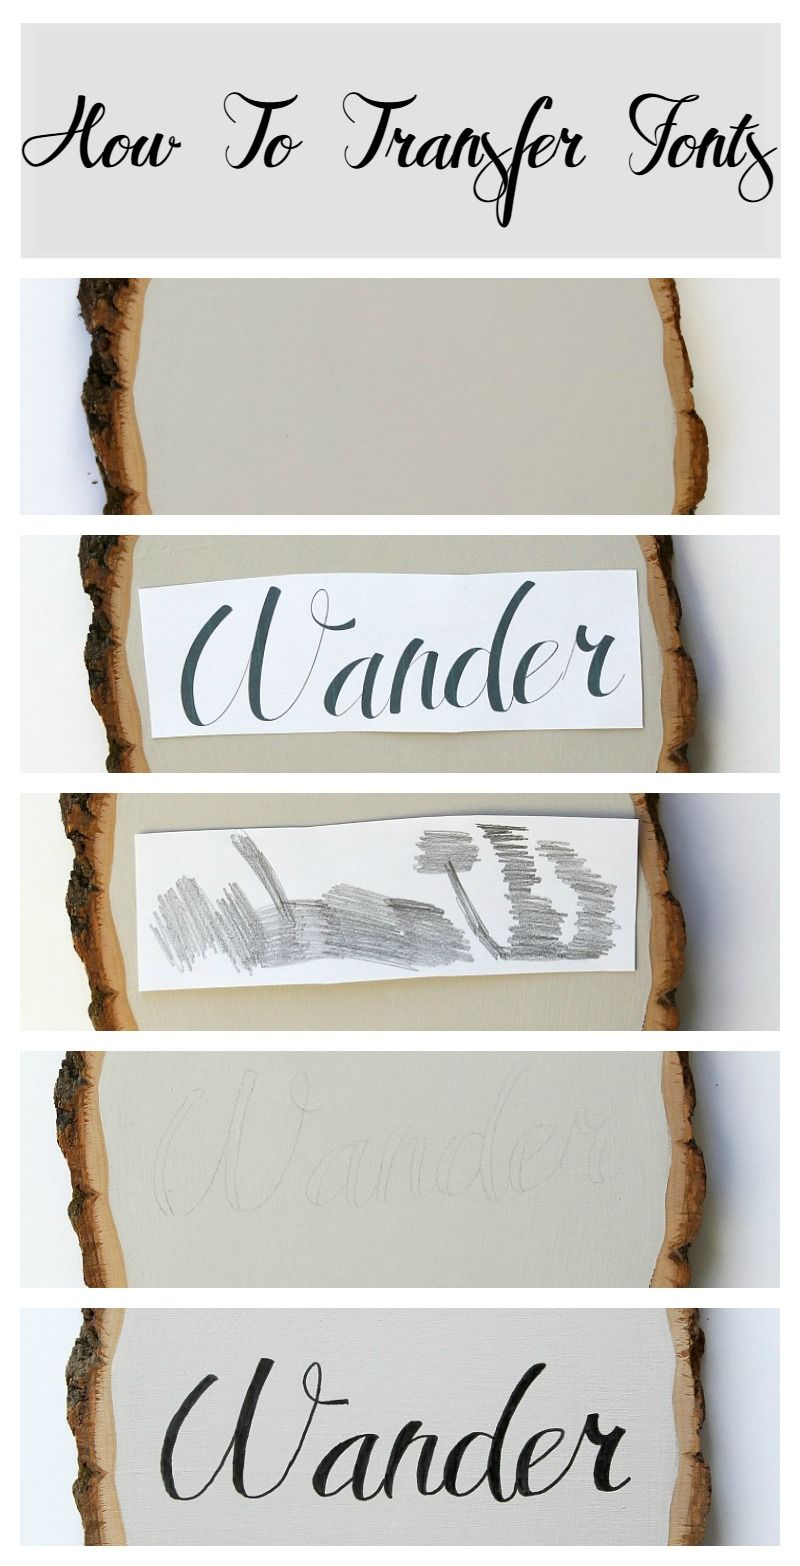 Easy Font Transfer Method for DIY Signs Diy signs, Sign